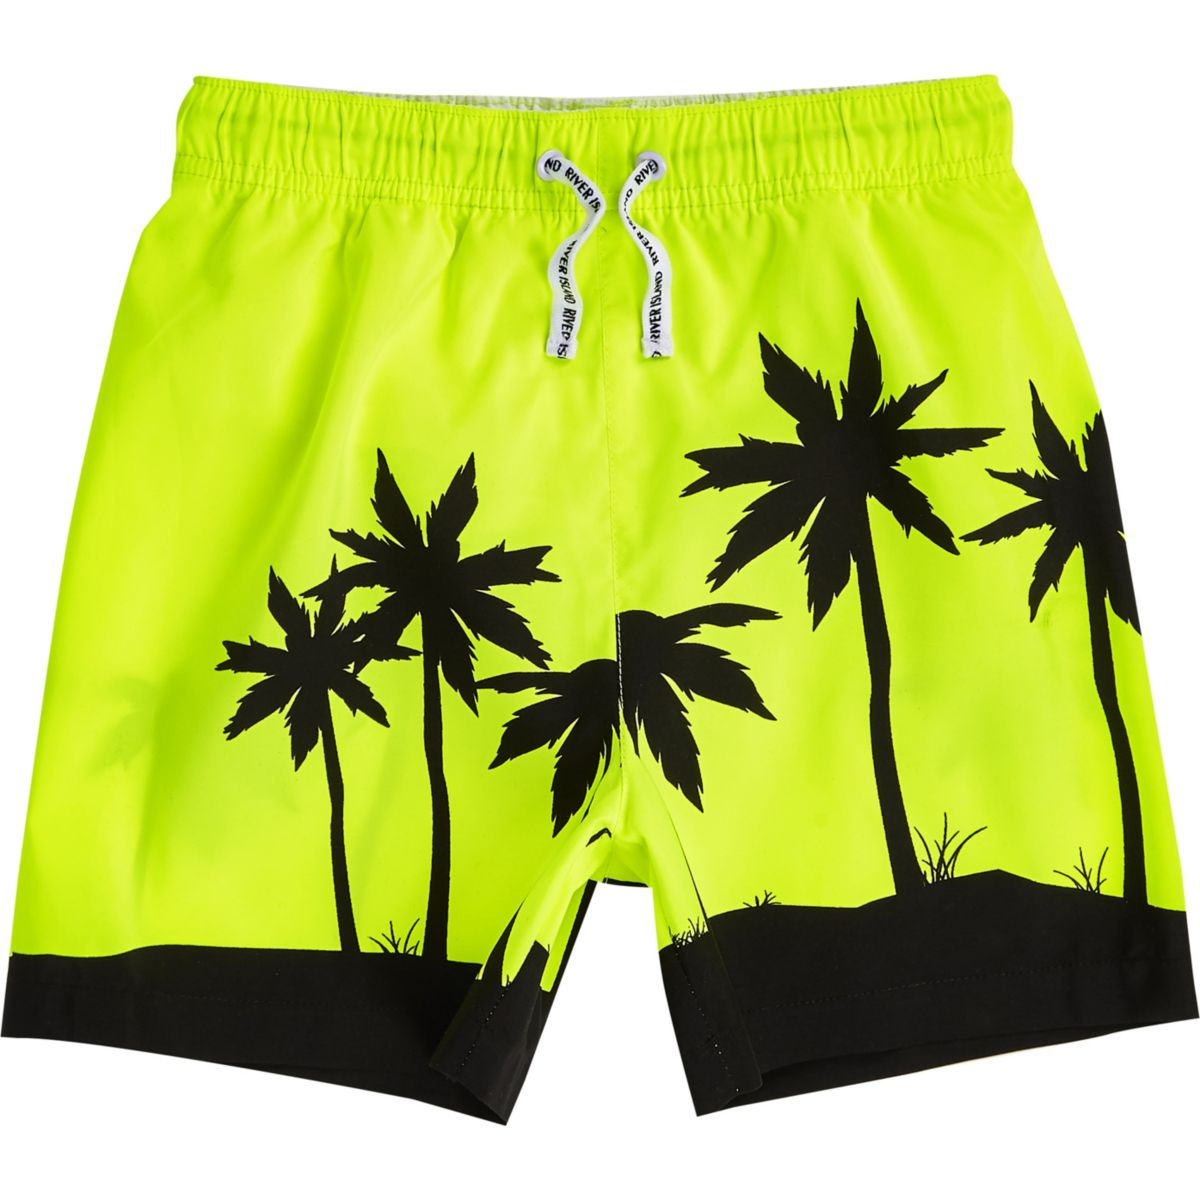 Boys bright yellow palm tree swim shorts